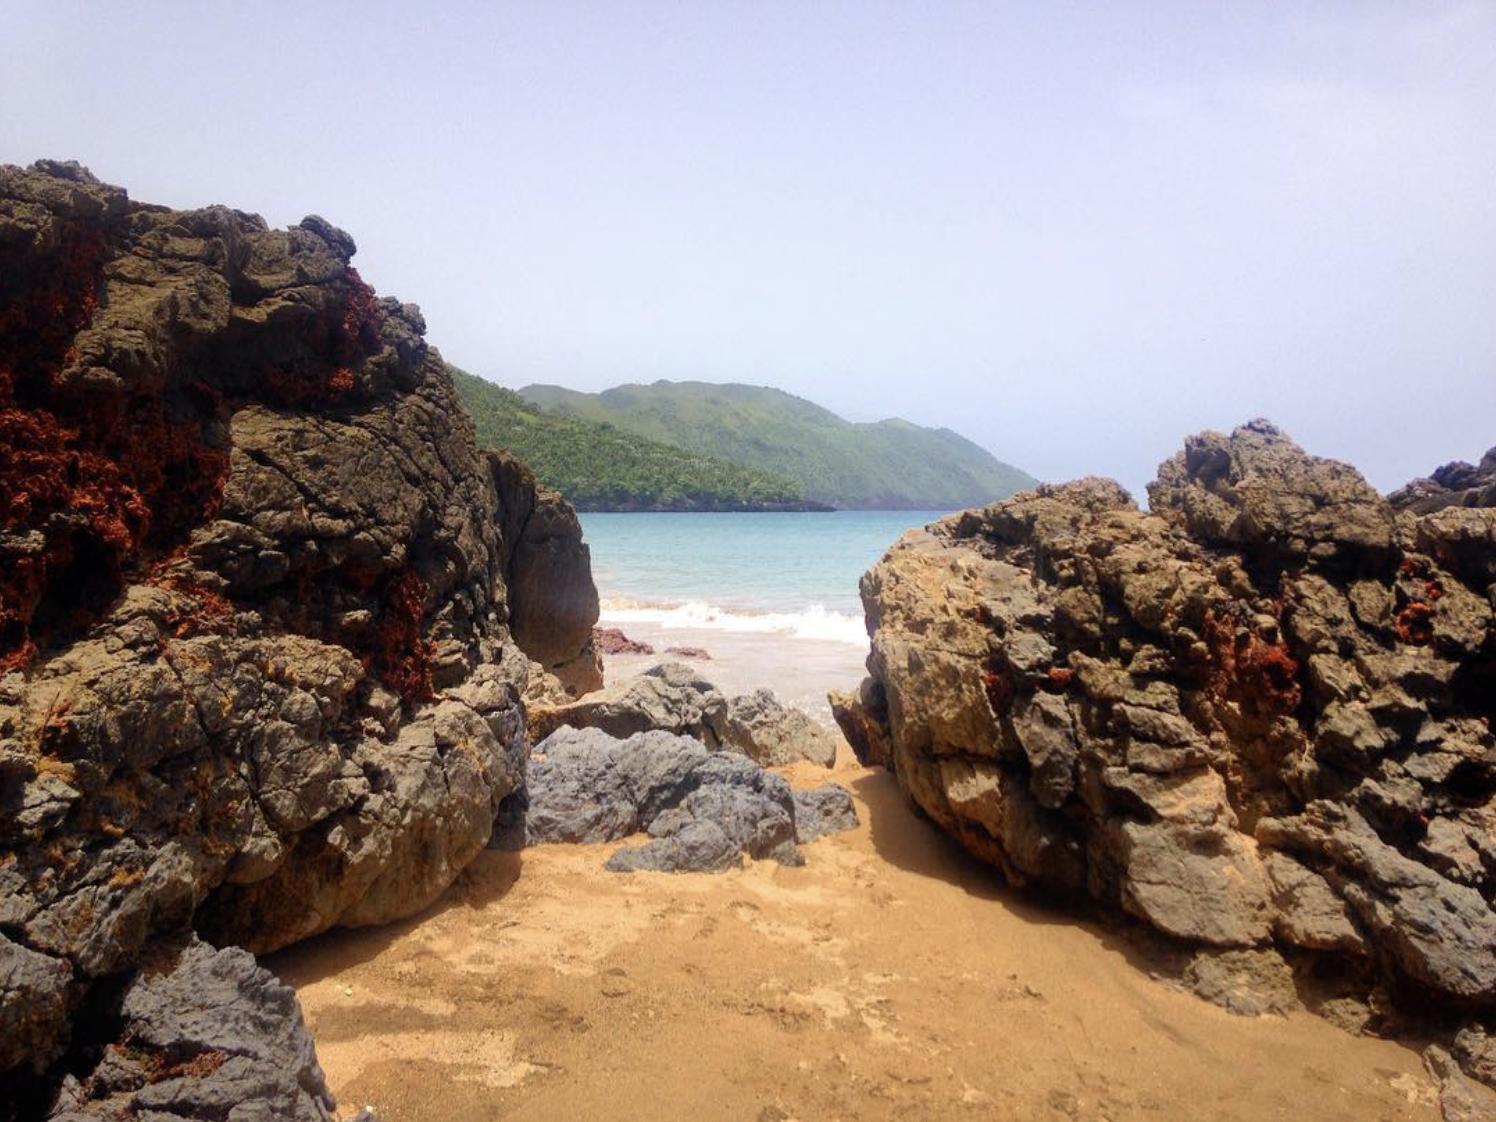 Scenic coastal view near Project Restauración, Dominican Republic.